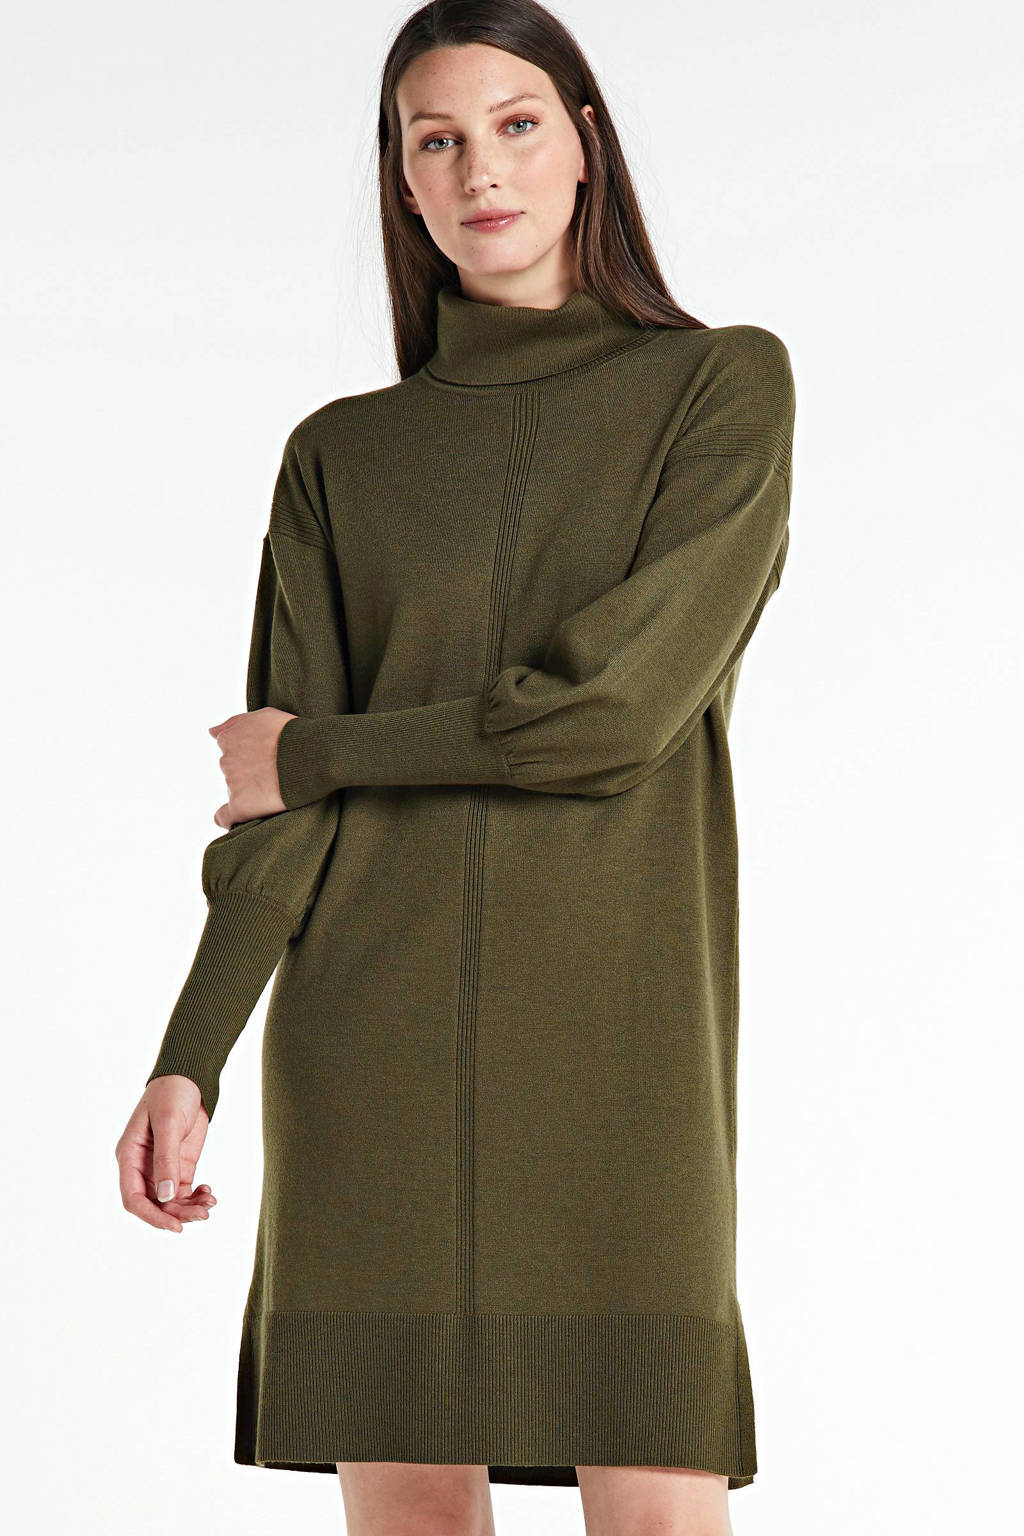 FREEQUENT jurk donkergroen, Donkergroen